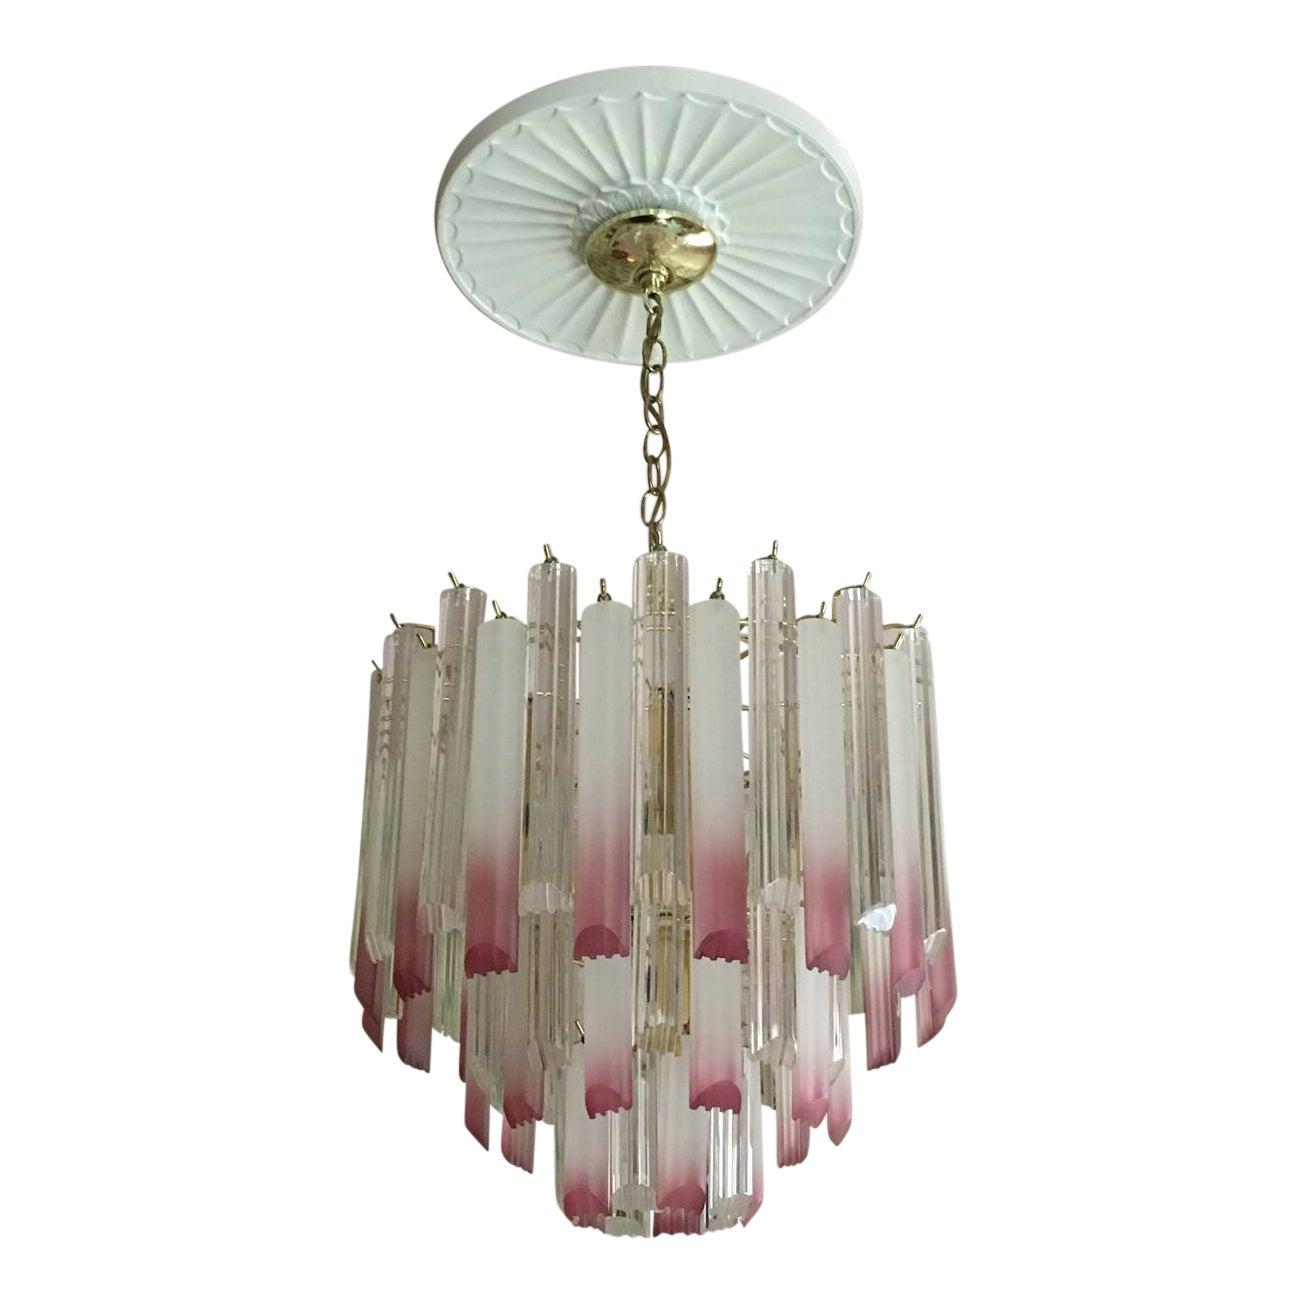 furniture chandeliers pendant lights gaetano lucite sale chrome sciolari chandelier twelve light id by and lighting brass x f for